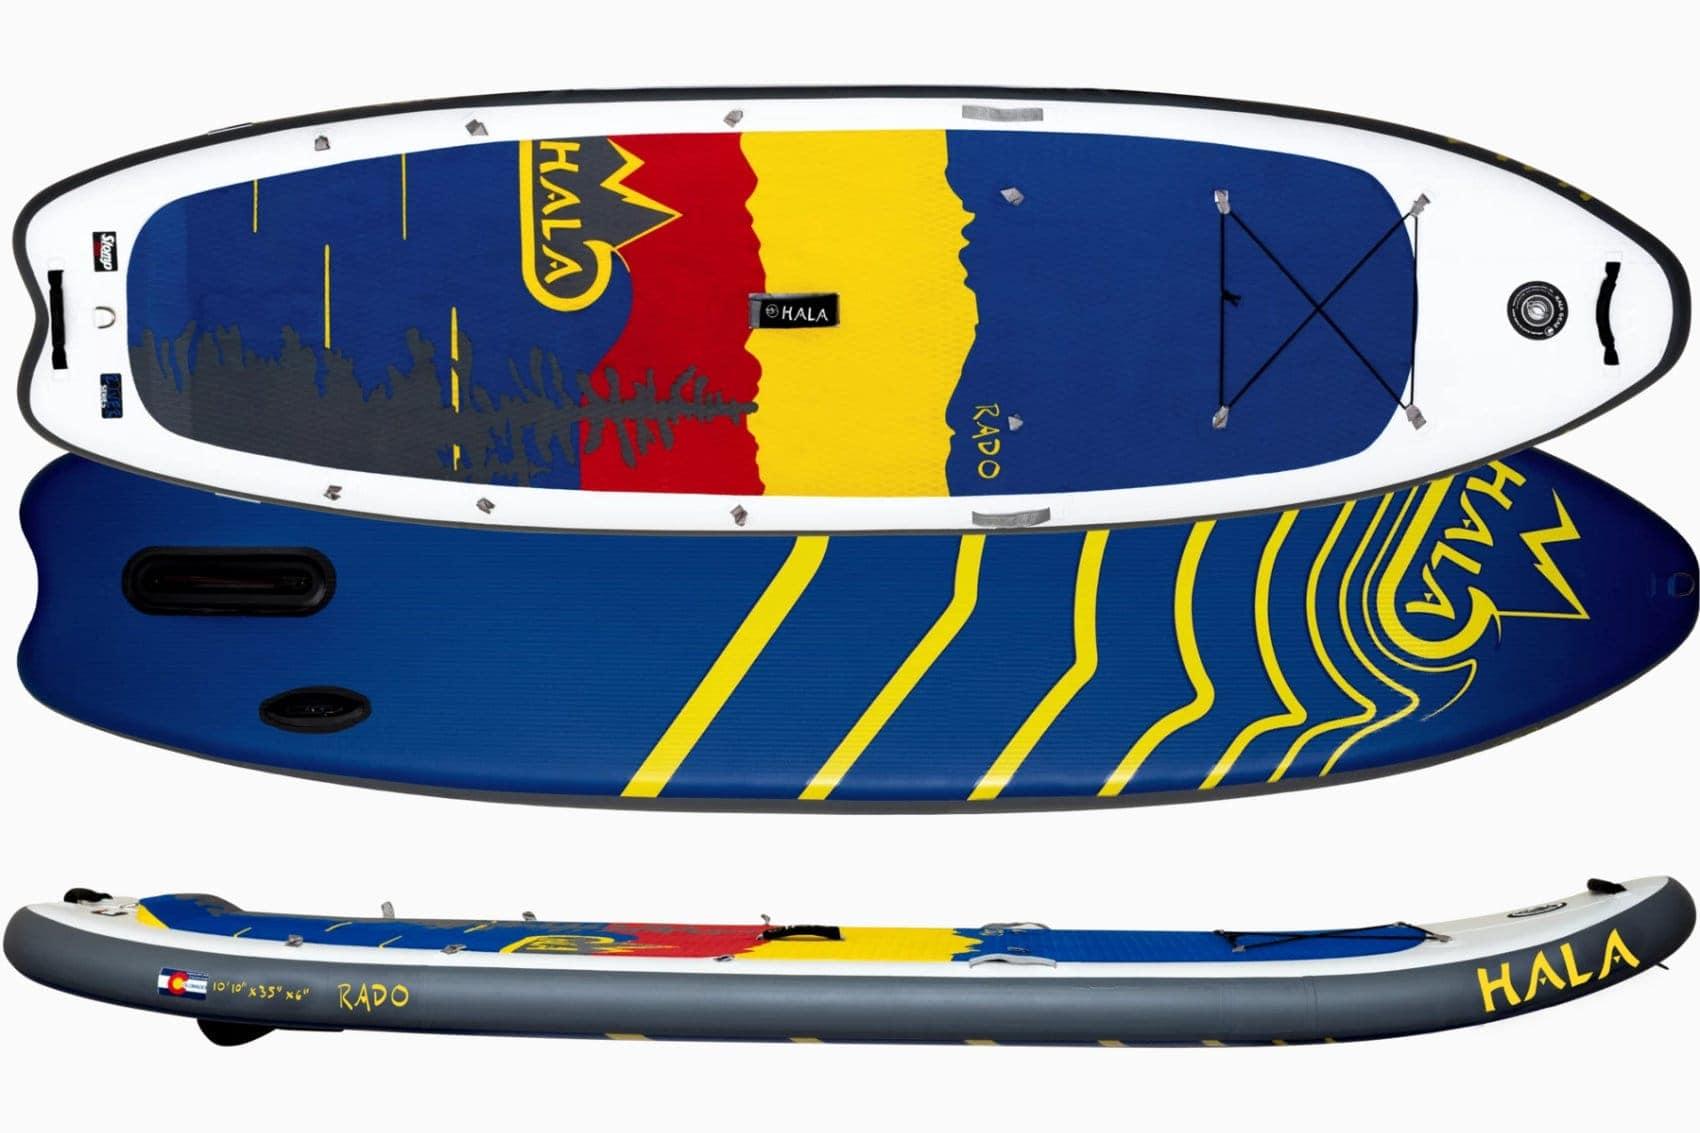 Hala Rado Inflatable Paddle Board